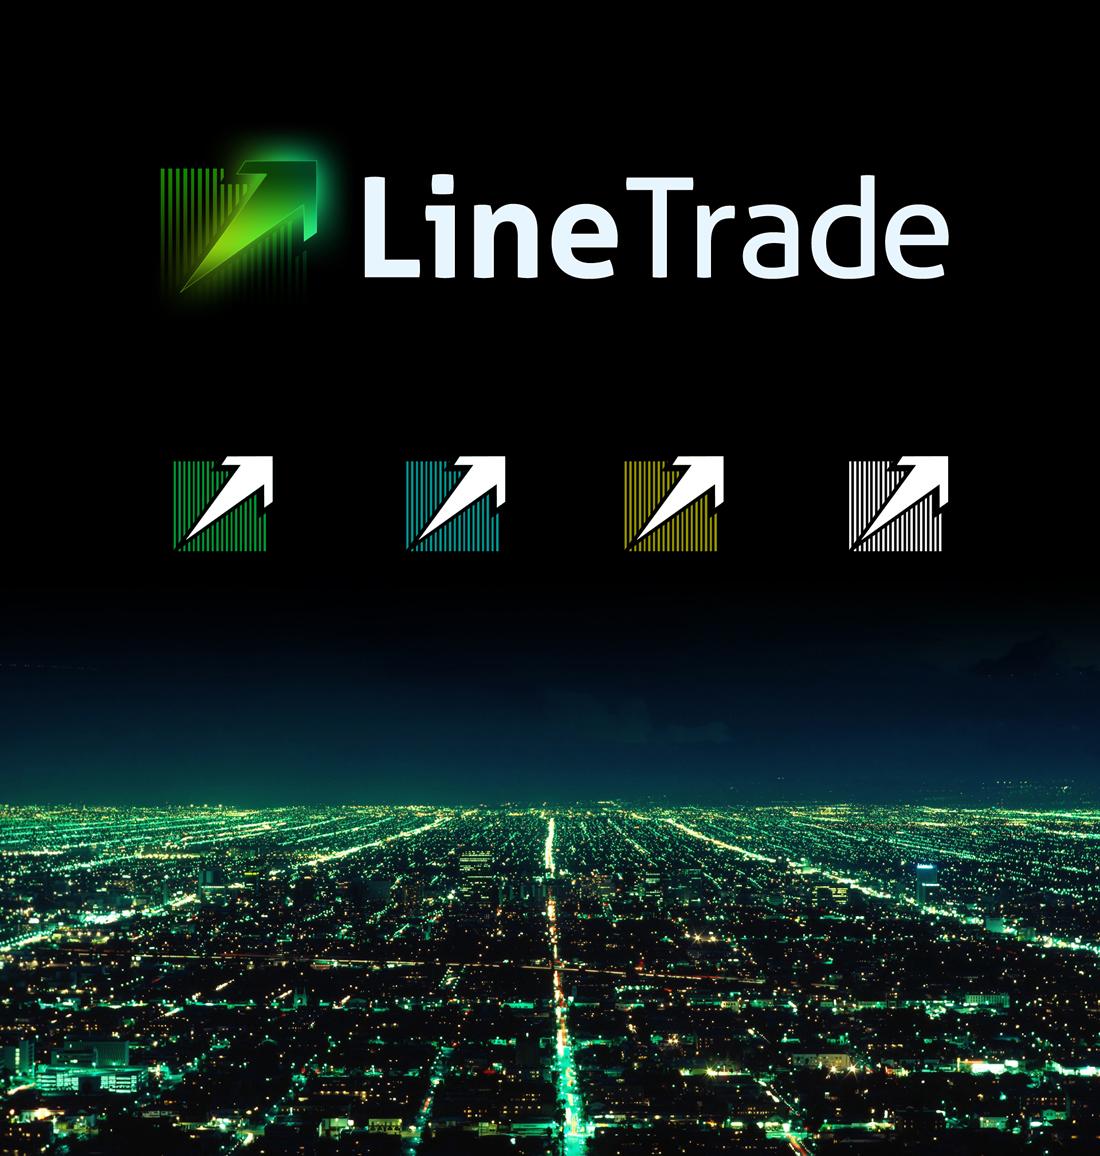 Разработка логотипа компании Line Trade фото f_77550fb7087e896e.jpg